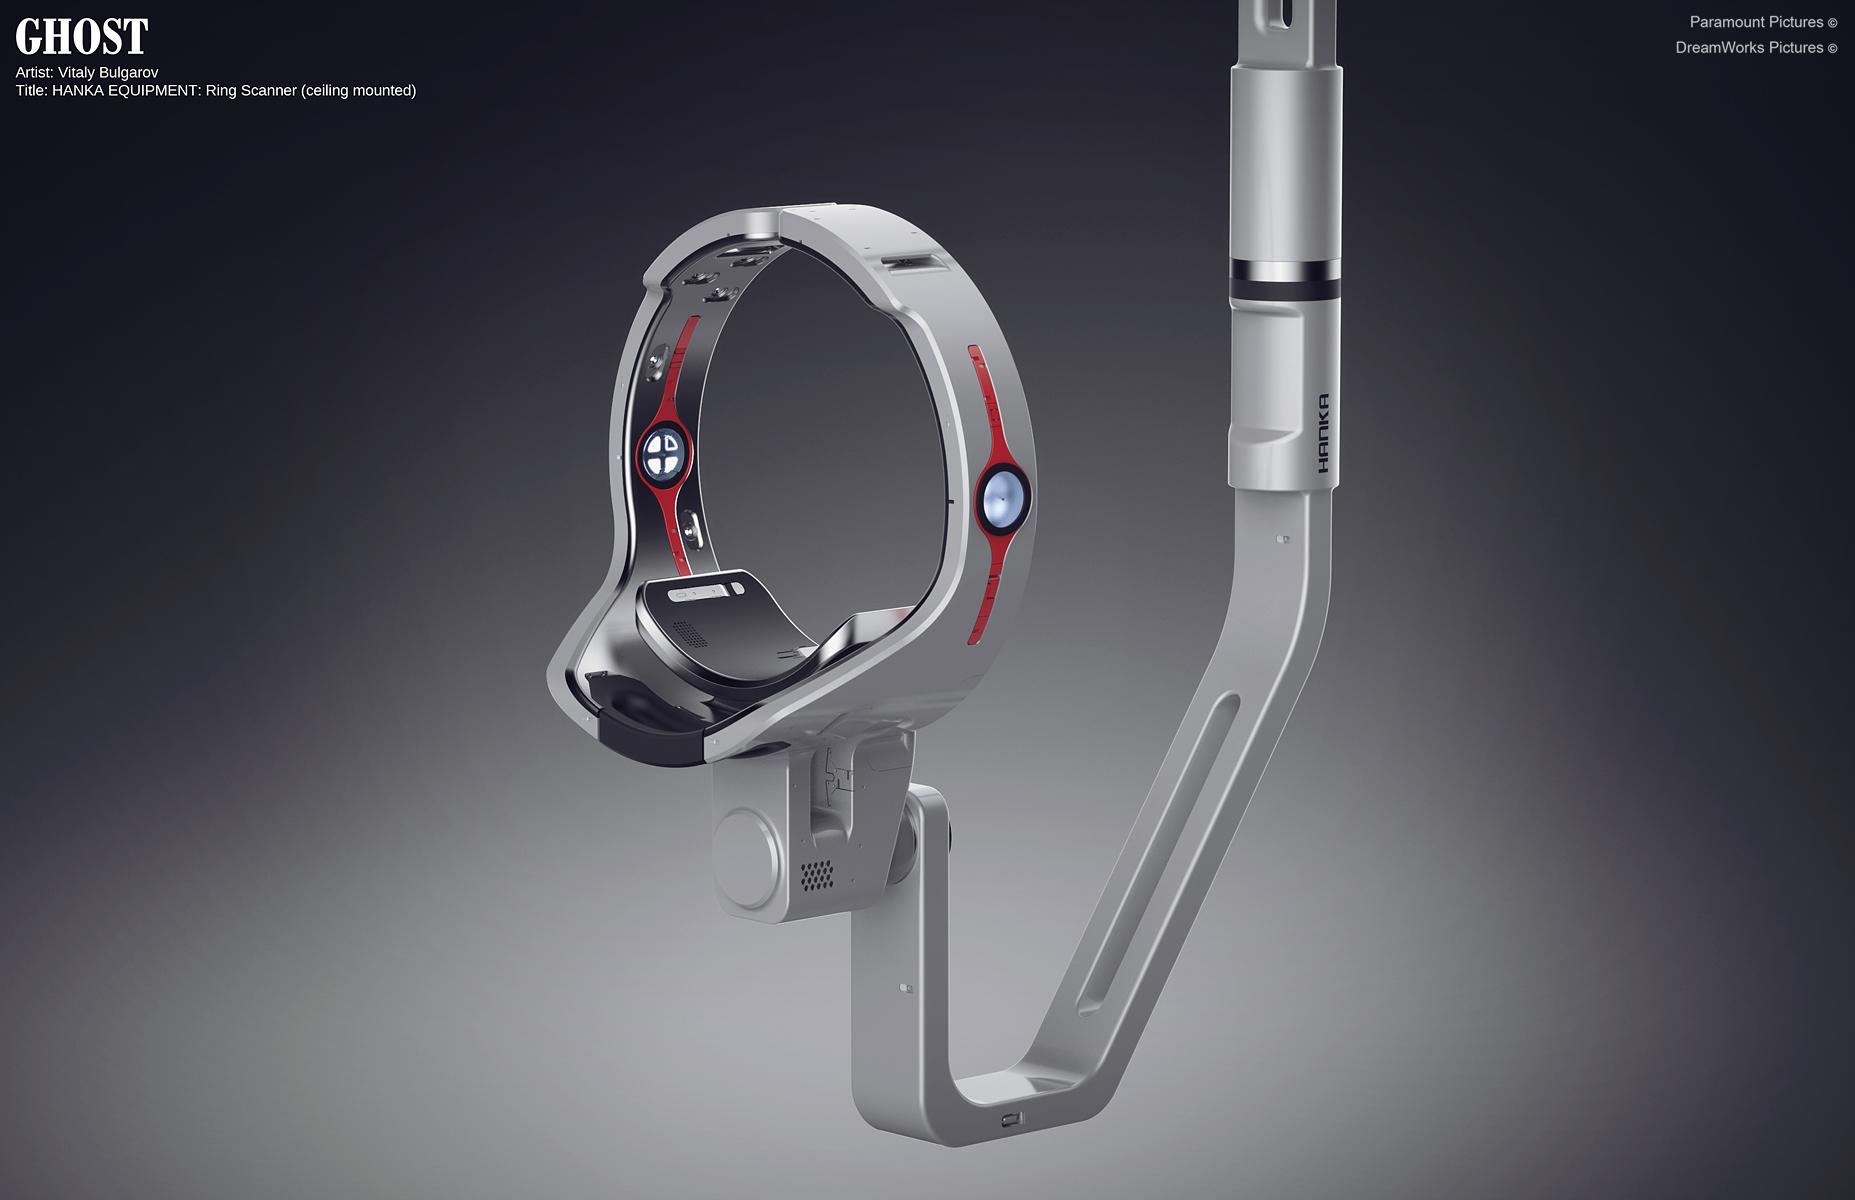 GITS_HANKA_SurgicalGear_Ring2_01.jpg